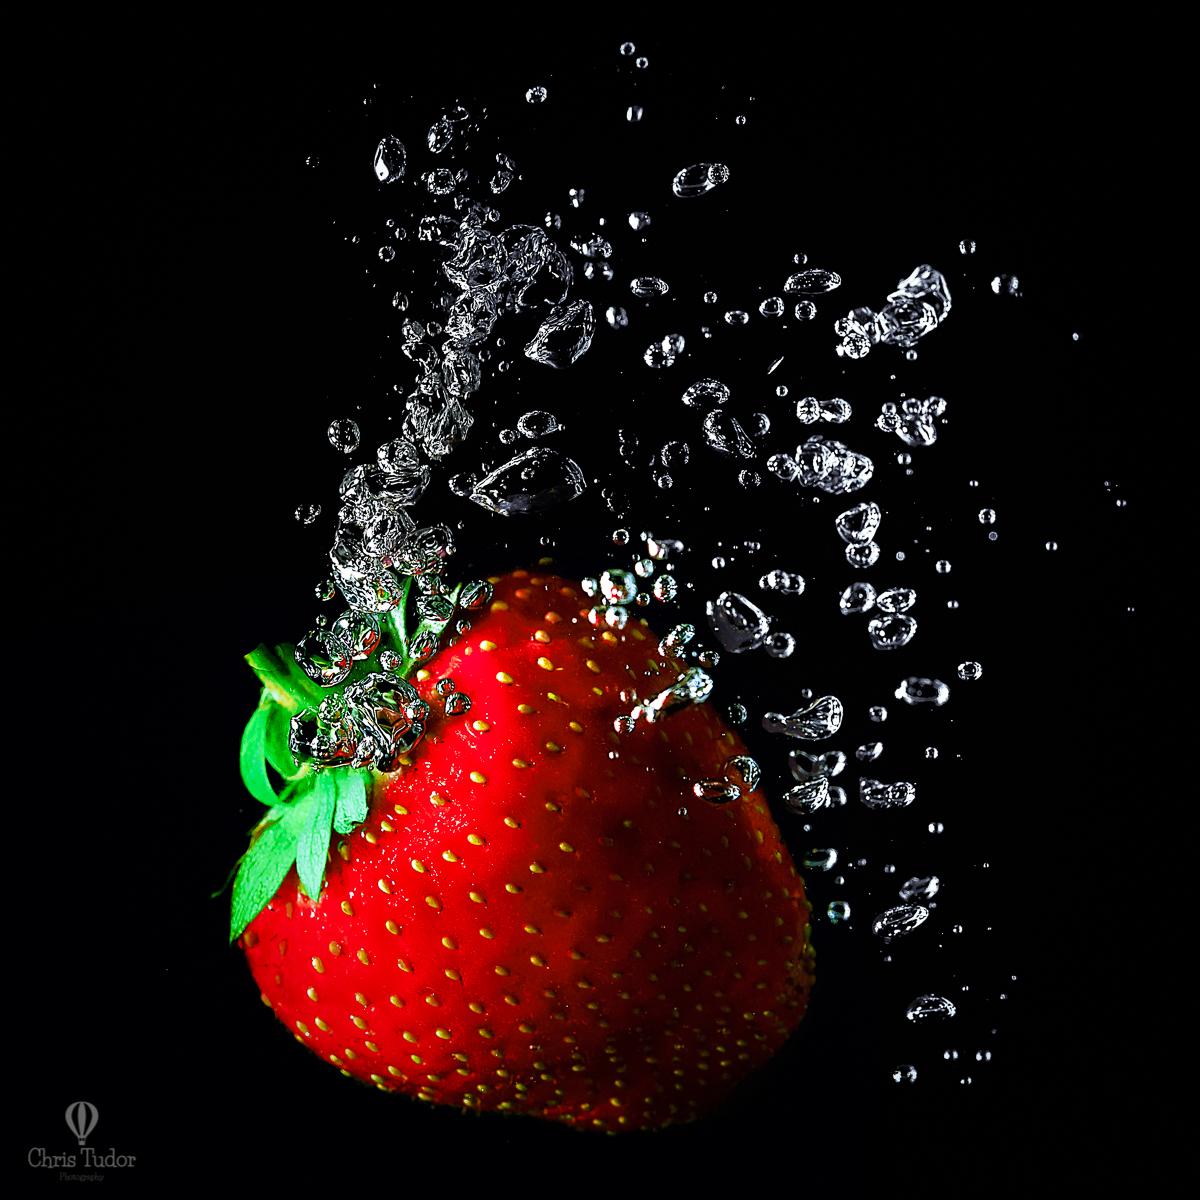 cristina-tudor-food-photography (50).jpg